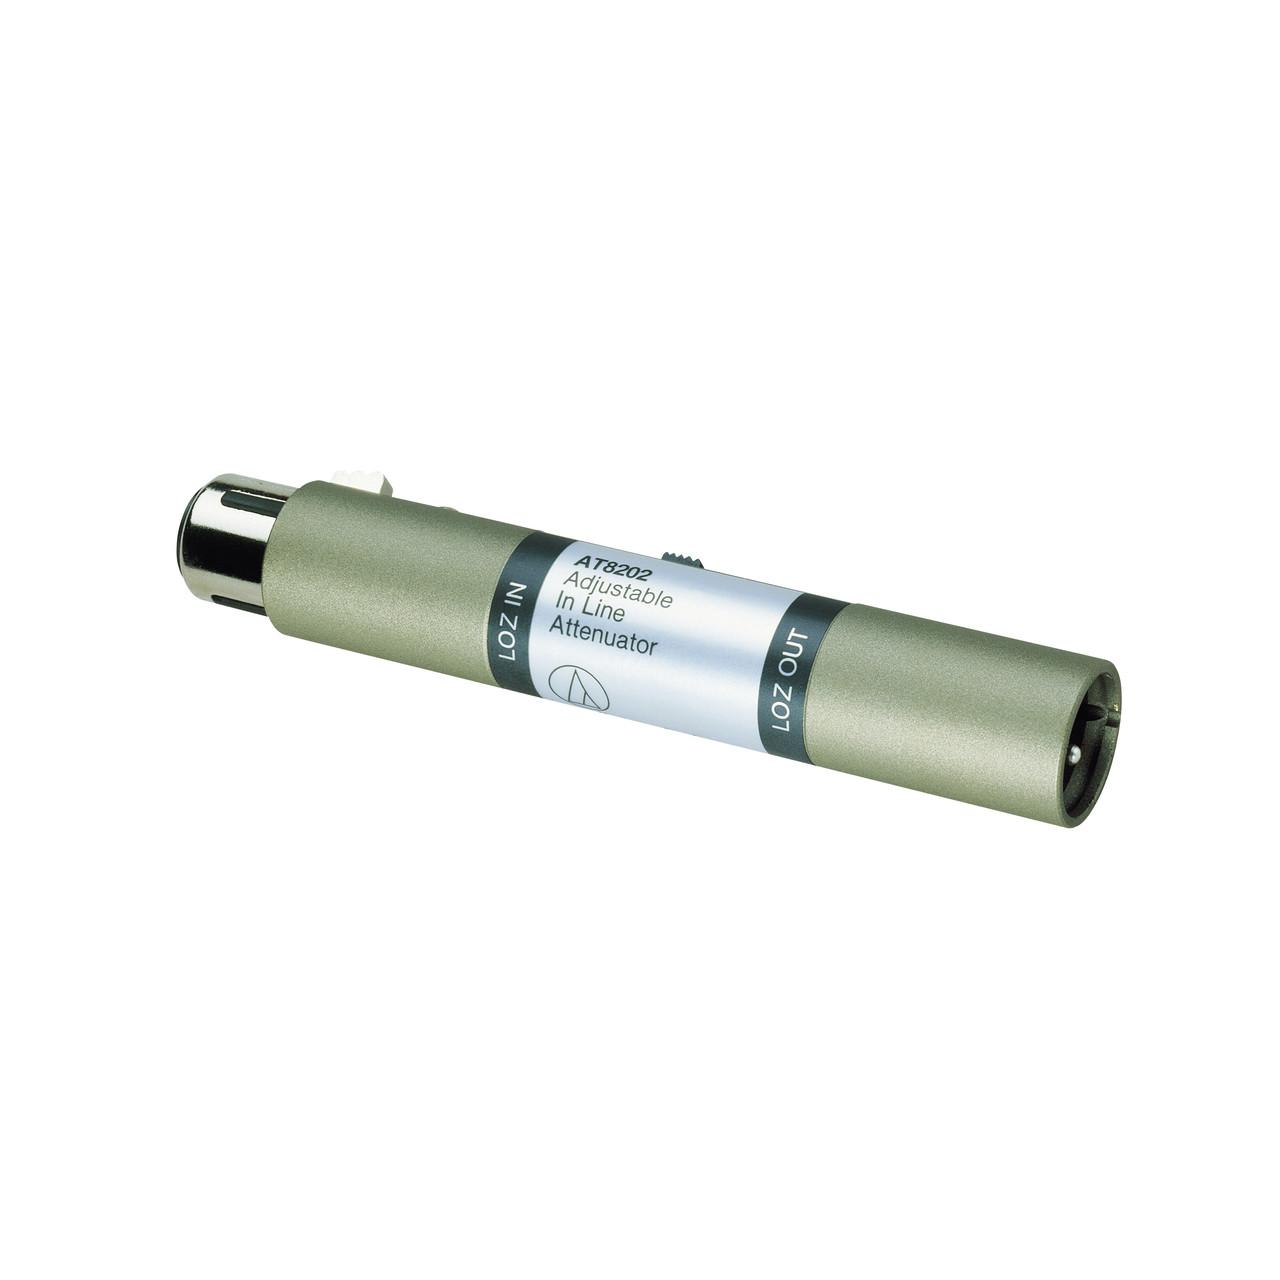 AT8202 In Line Attenuator